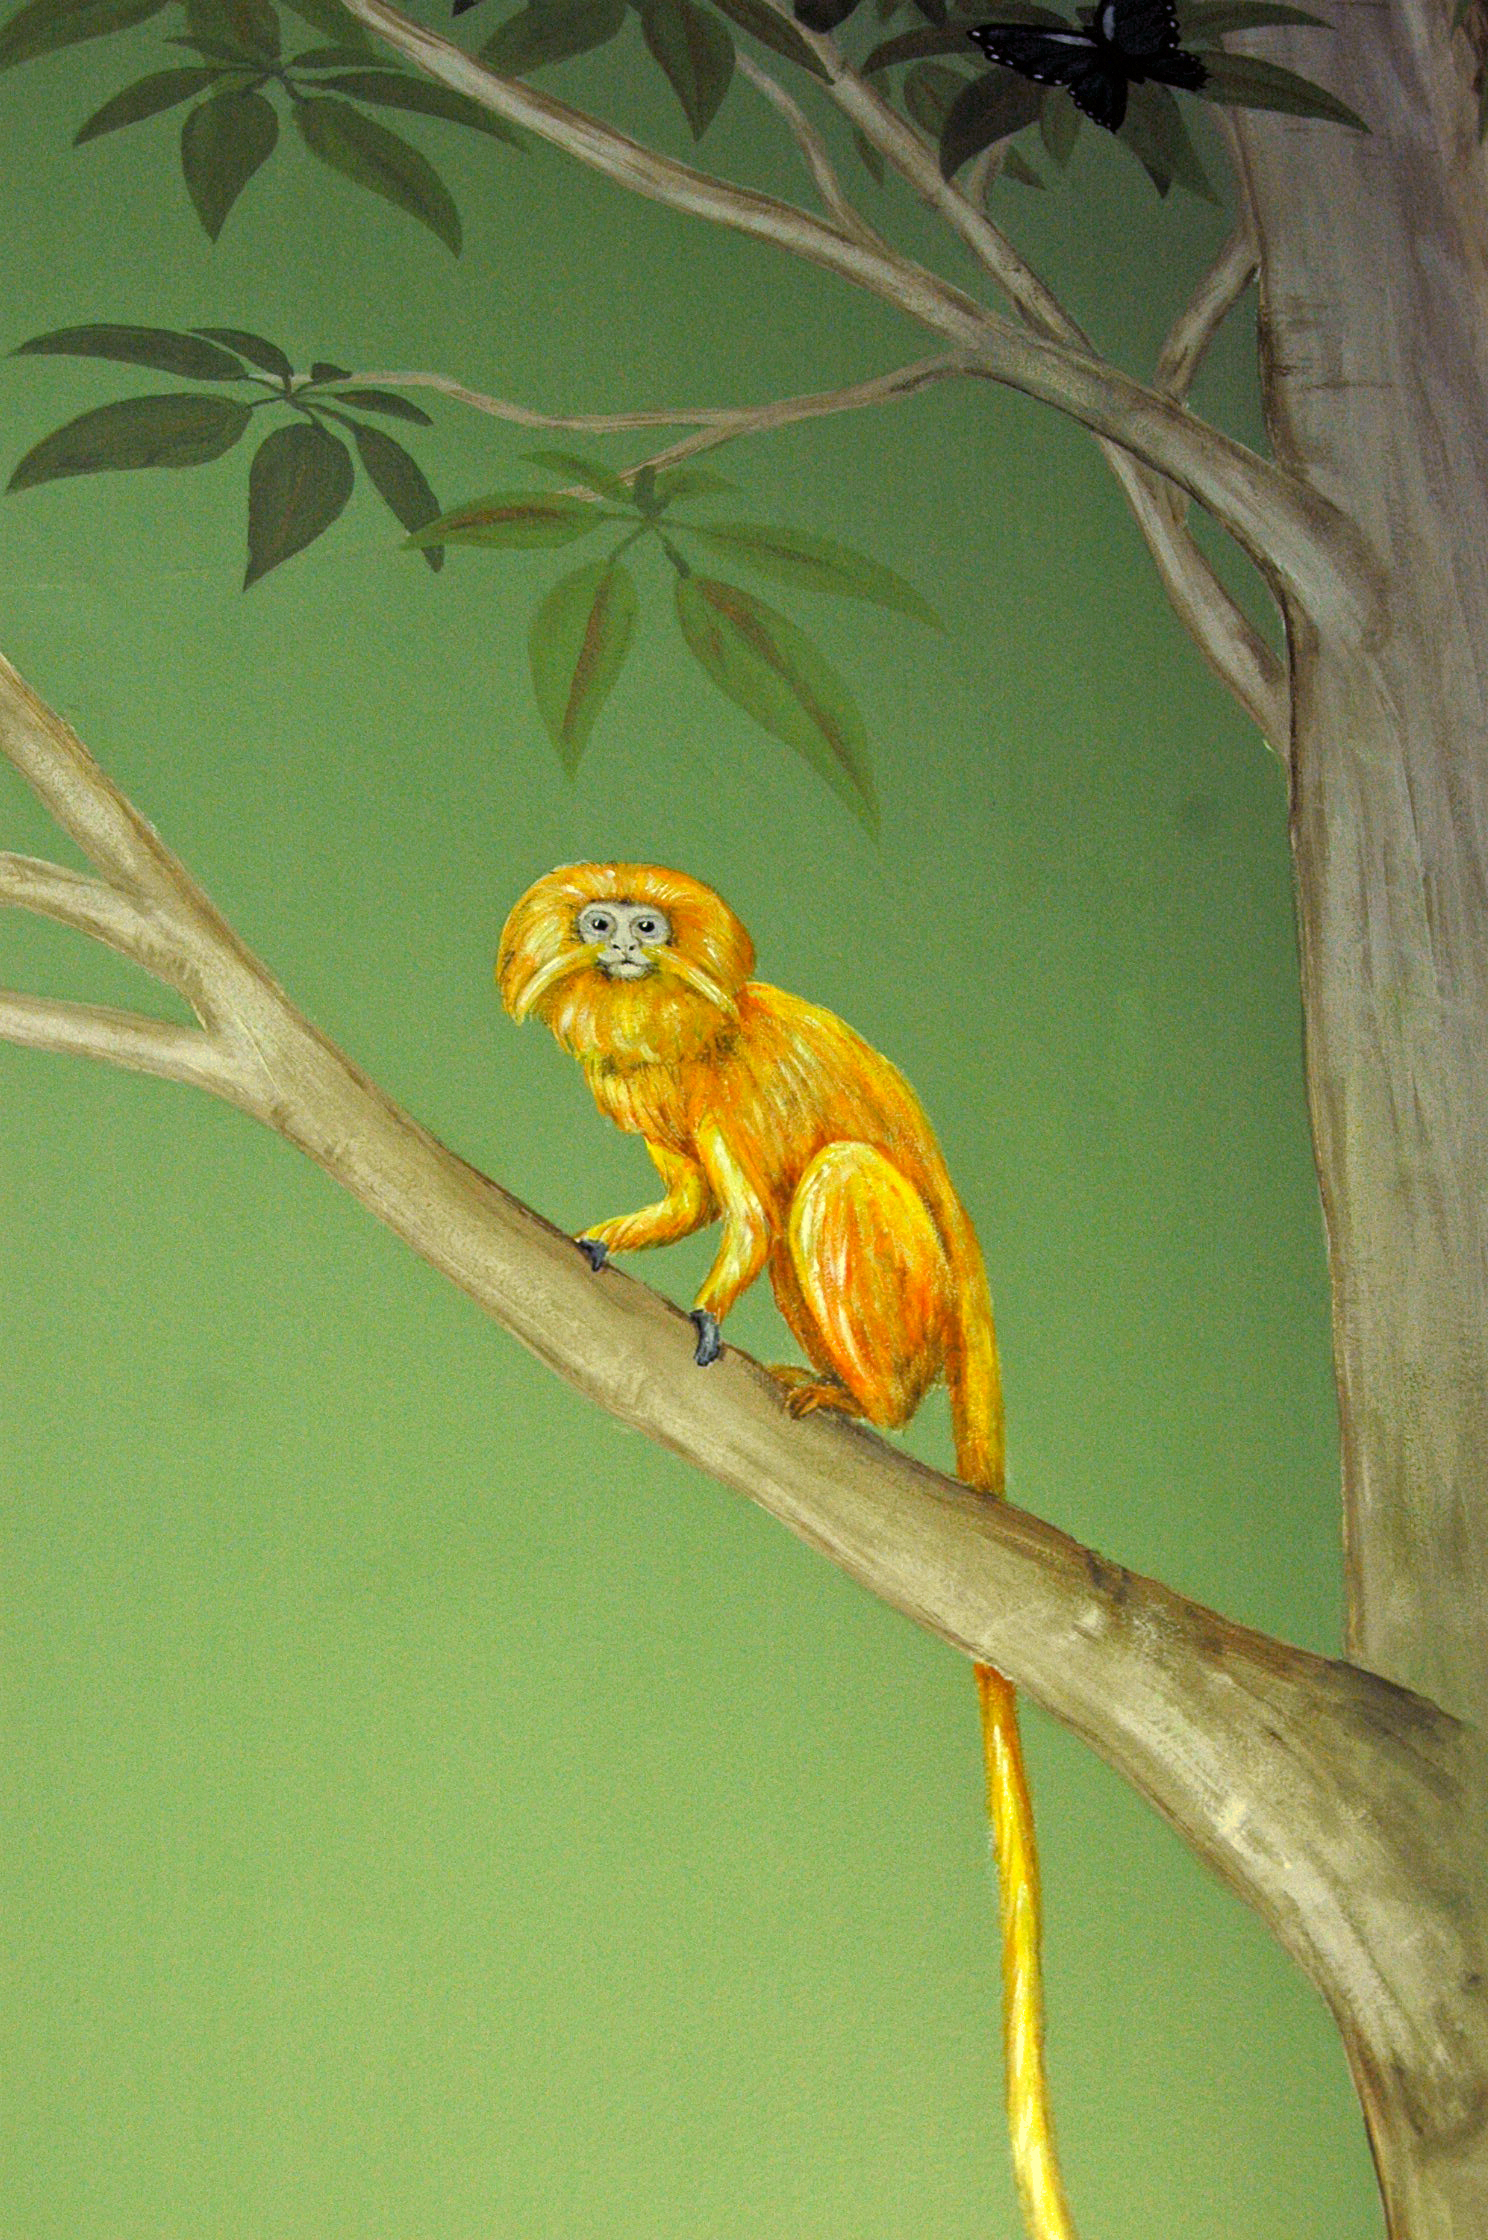 Rainforest Tamir Frederick Wimsett - murals and artistic design - other projects.jpg